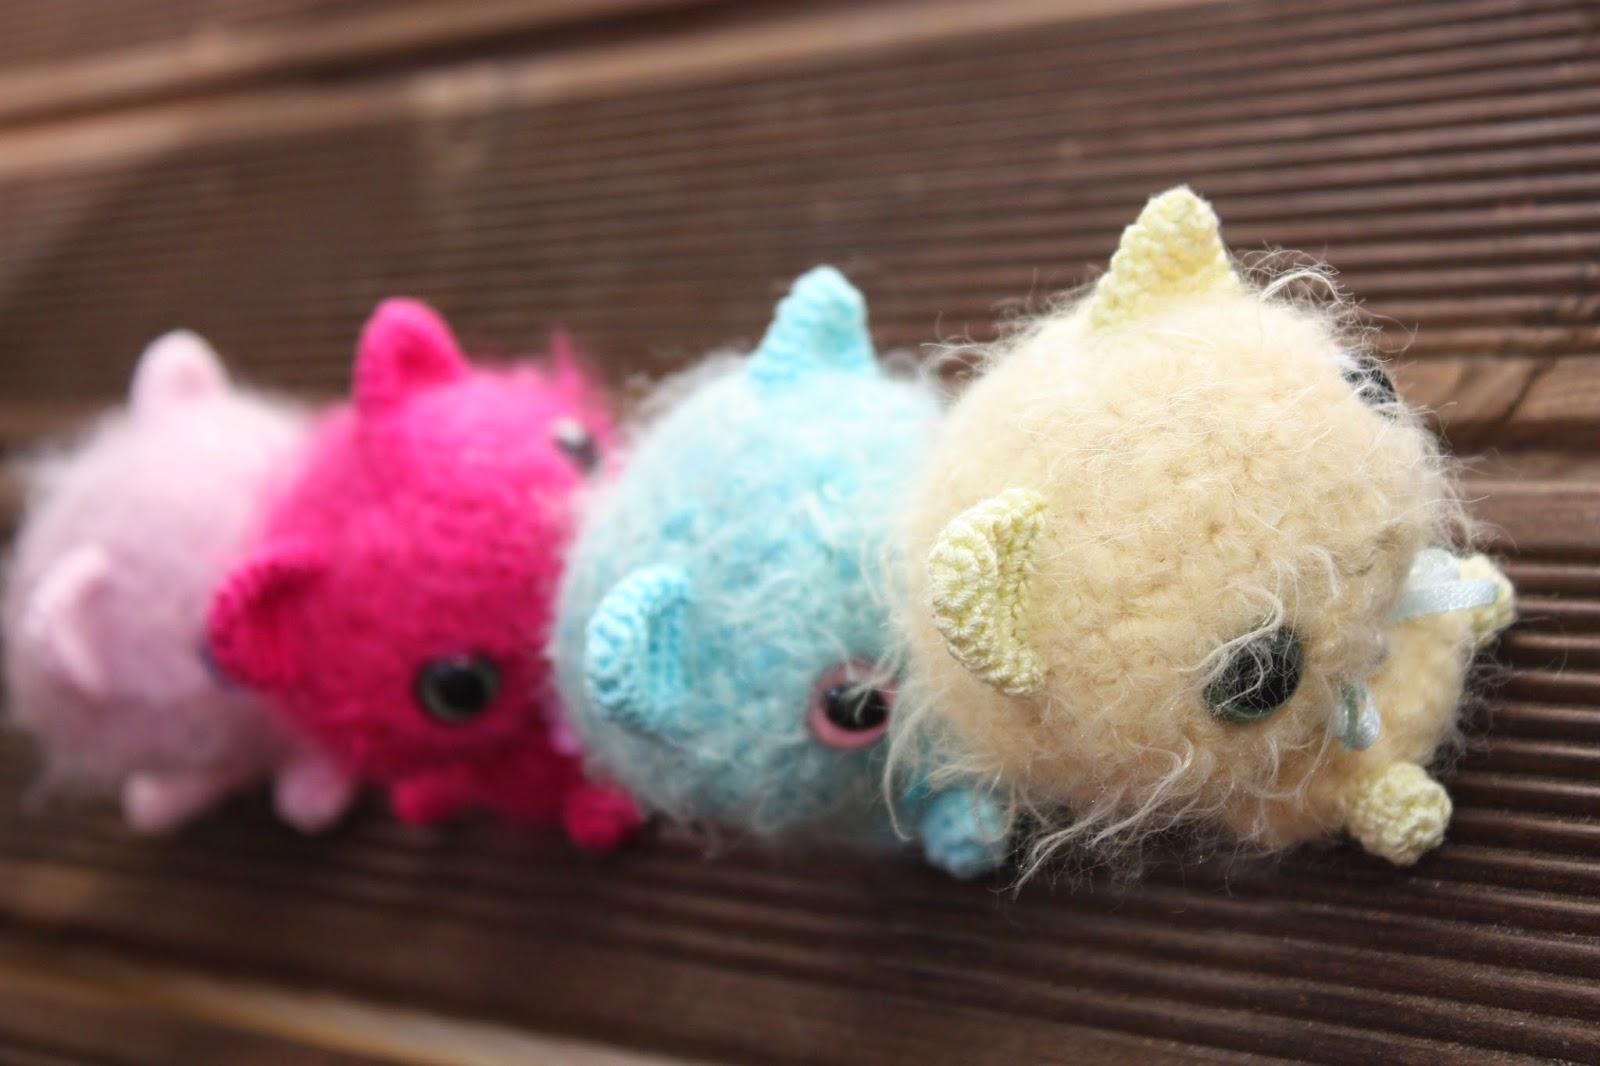 Amigurumi Cat : HAPPYAMIGURUMI: NEW PATTERN: Amigurumi Pearlcat with a Giftbag